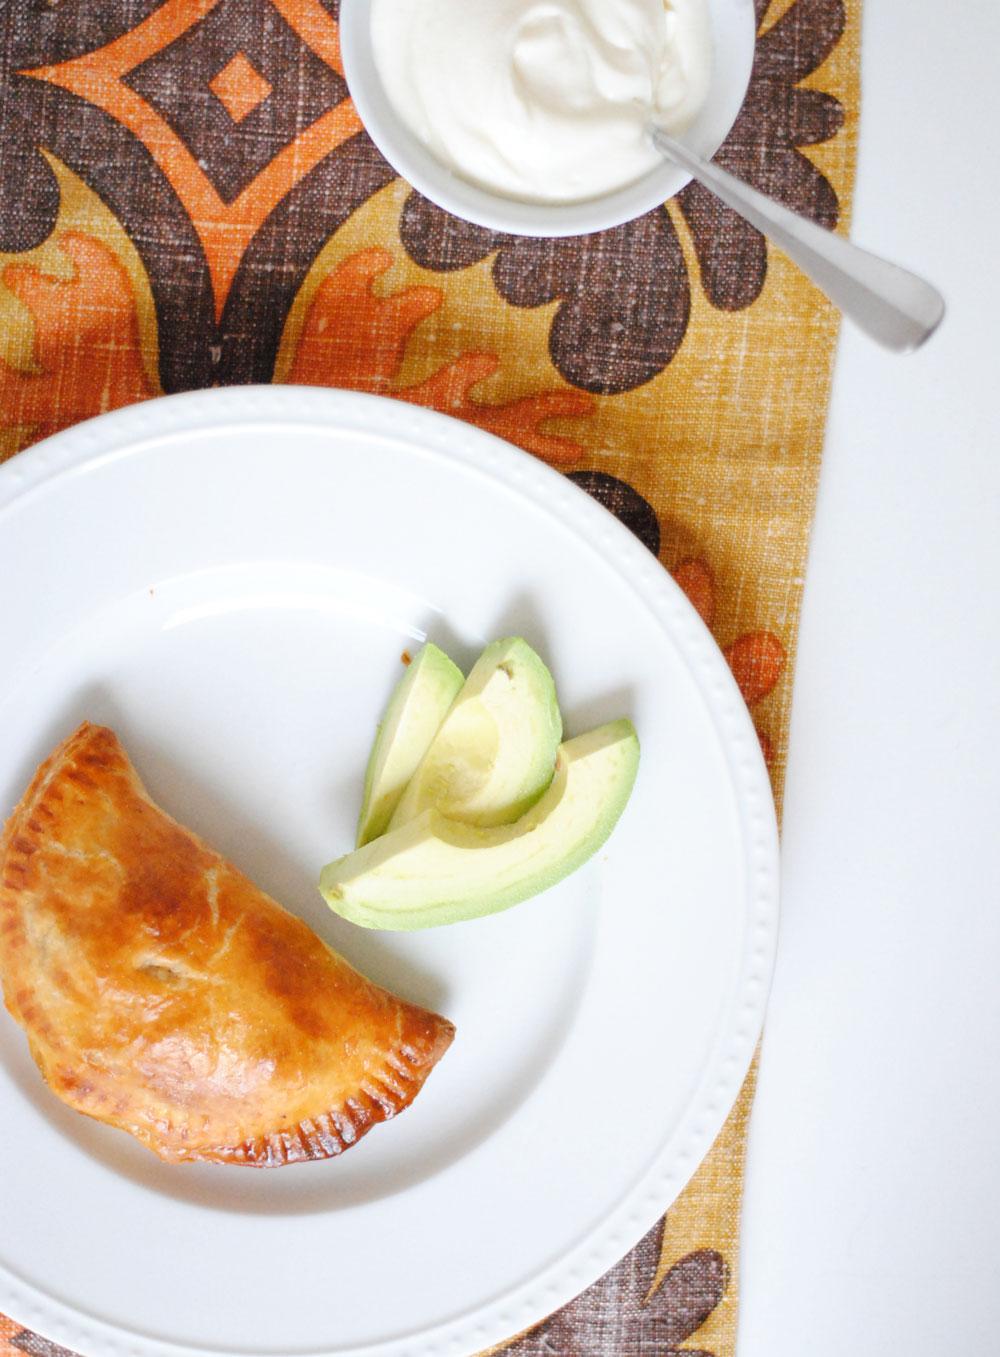 ... Empanadas with Slow Cooker Pork Carnitas Filling | Hottie Biscotti